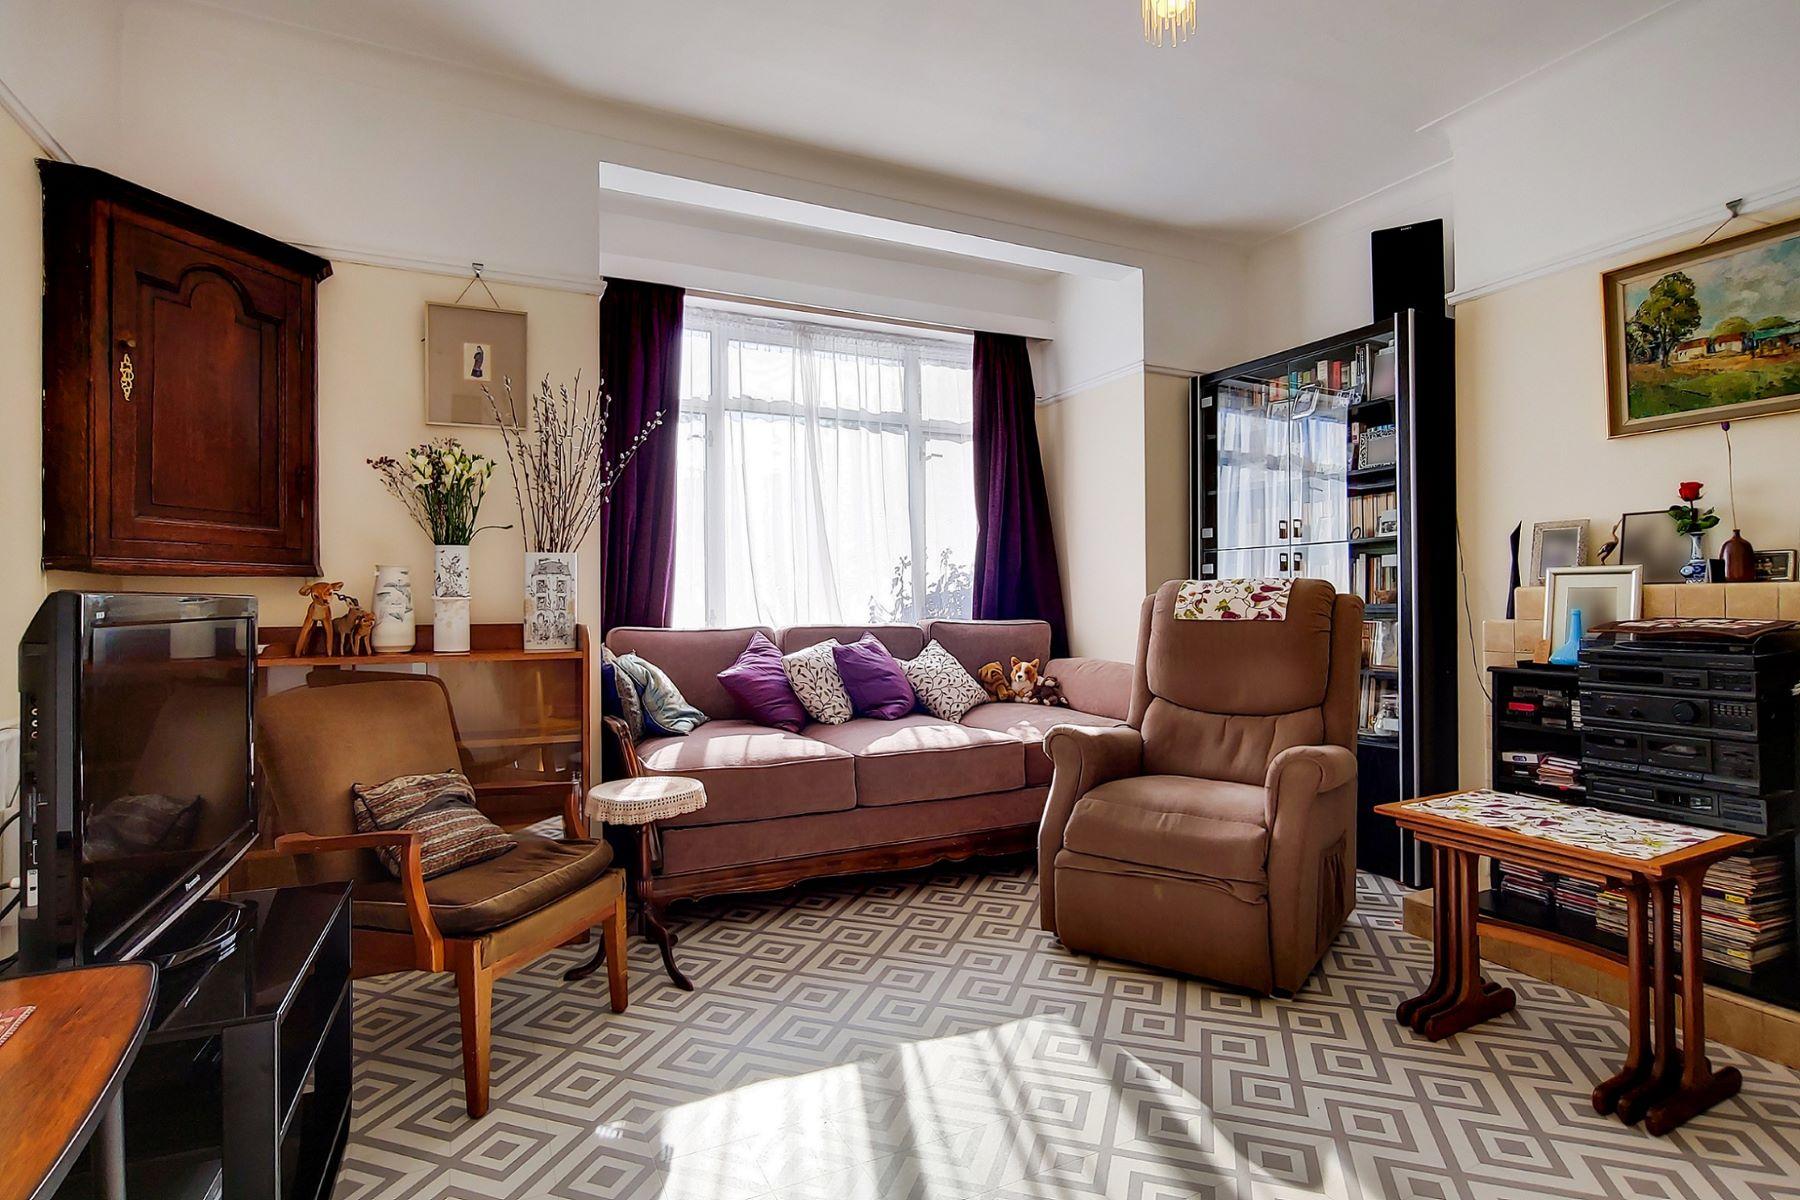 Single Family Homes for Sale at 34 Brookwood Brookwood Avenue London, England SW13 0LR United Kingdom